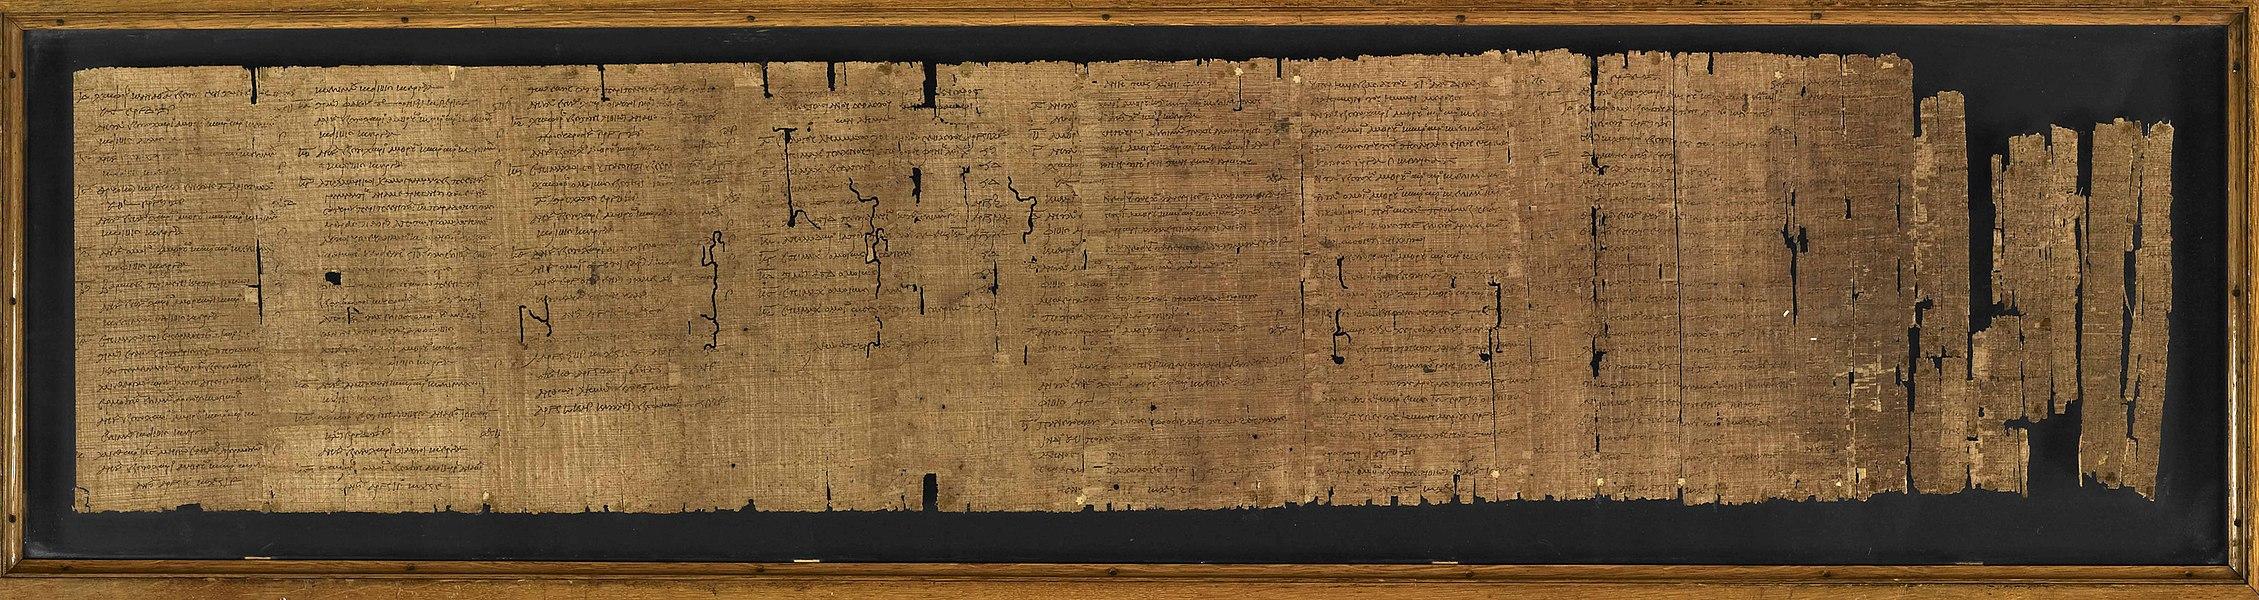 papyrus - image 1